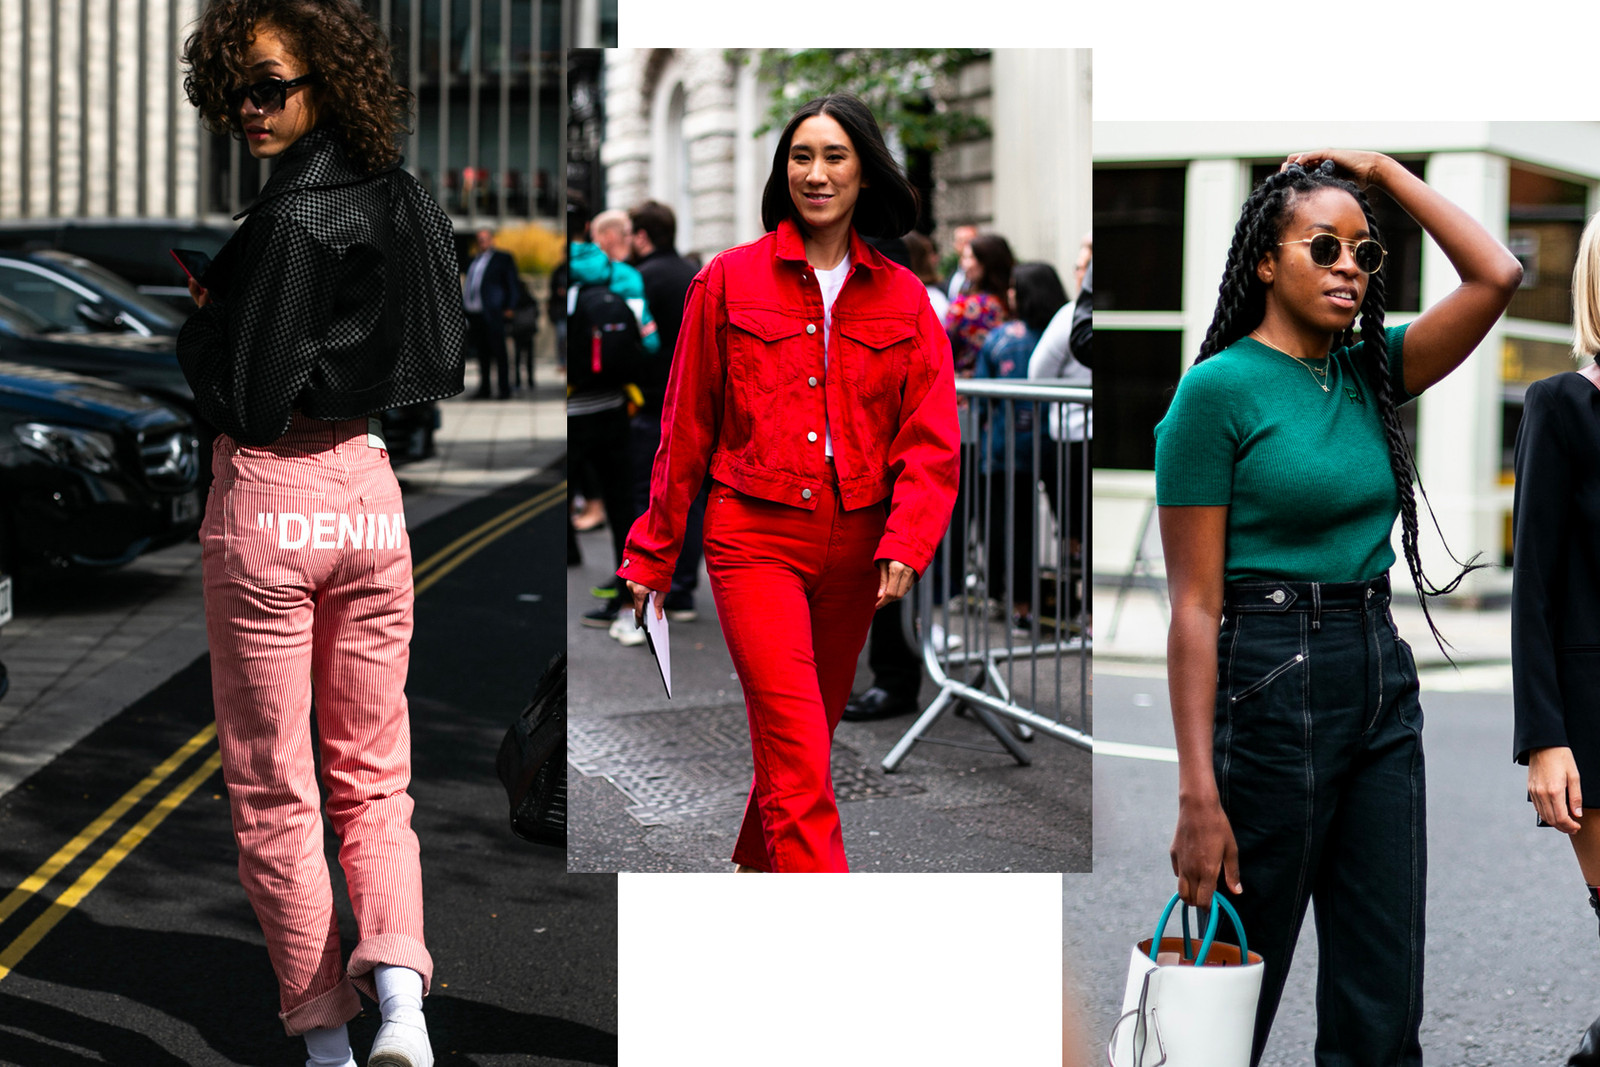 Fendi Fila Logo Fanny Pack Belt Bag London Fashion Week Spring Summer 2019 Street Style